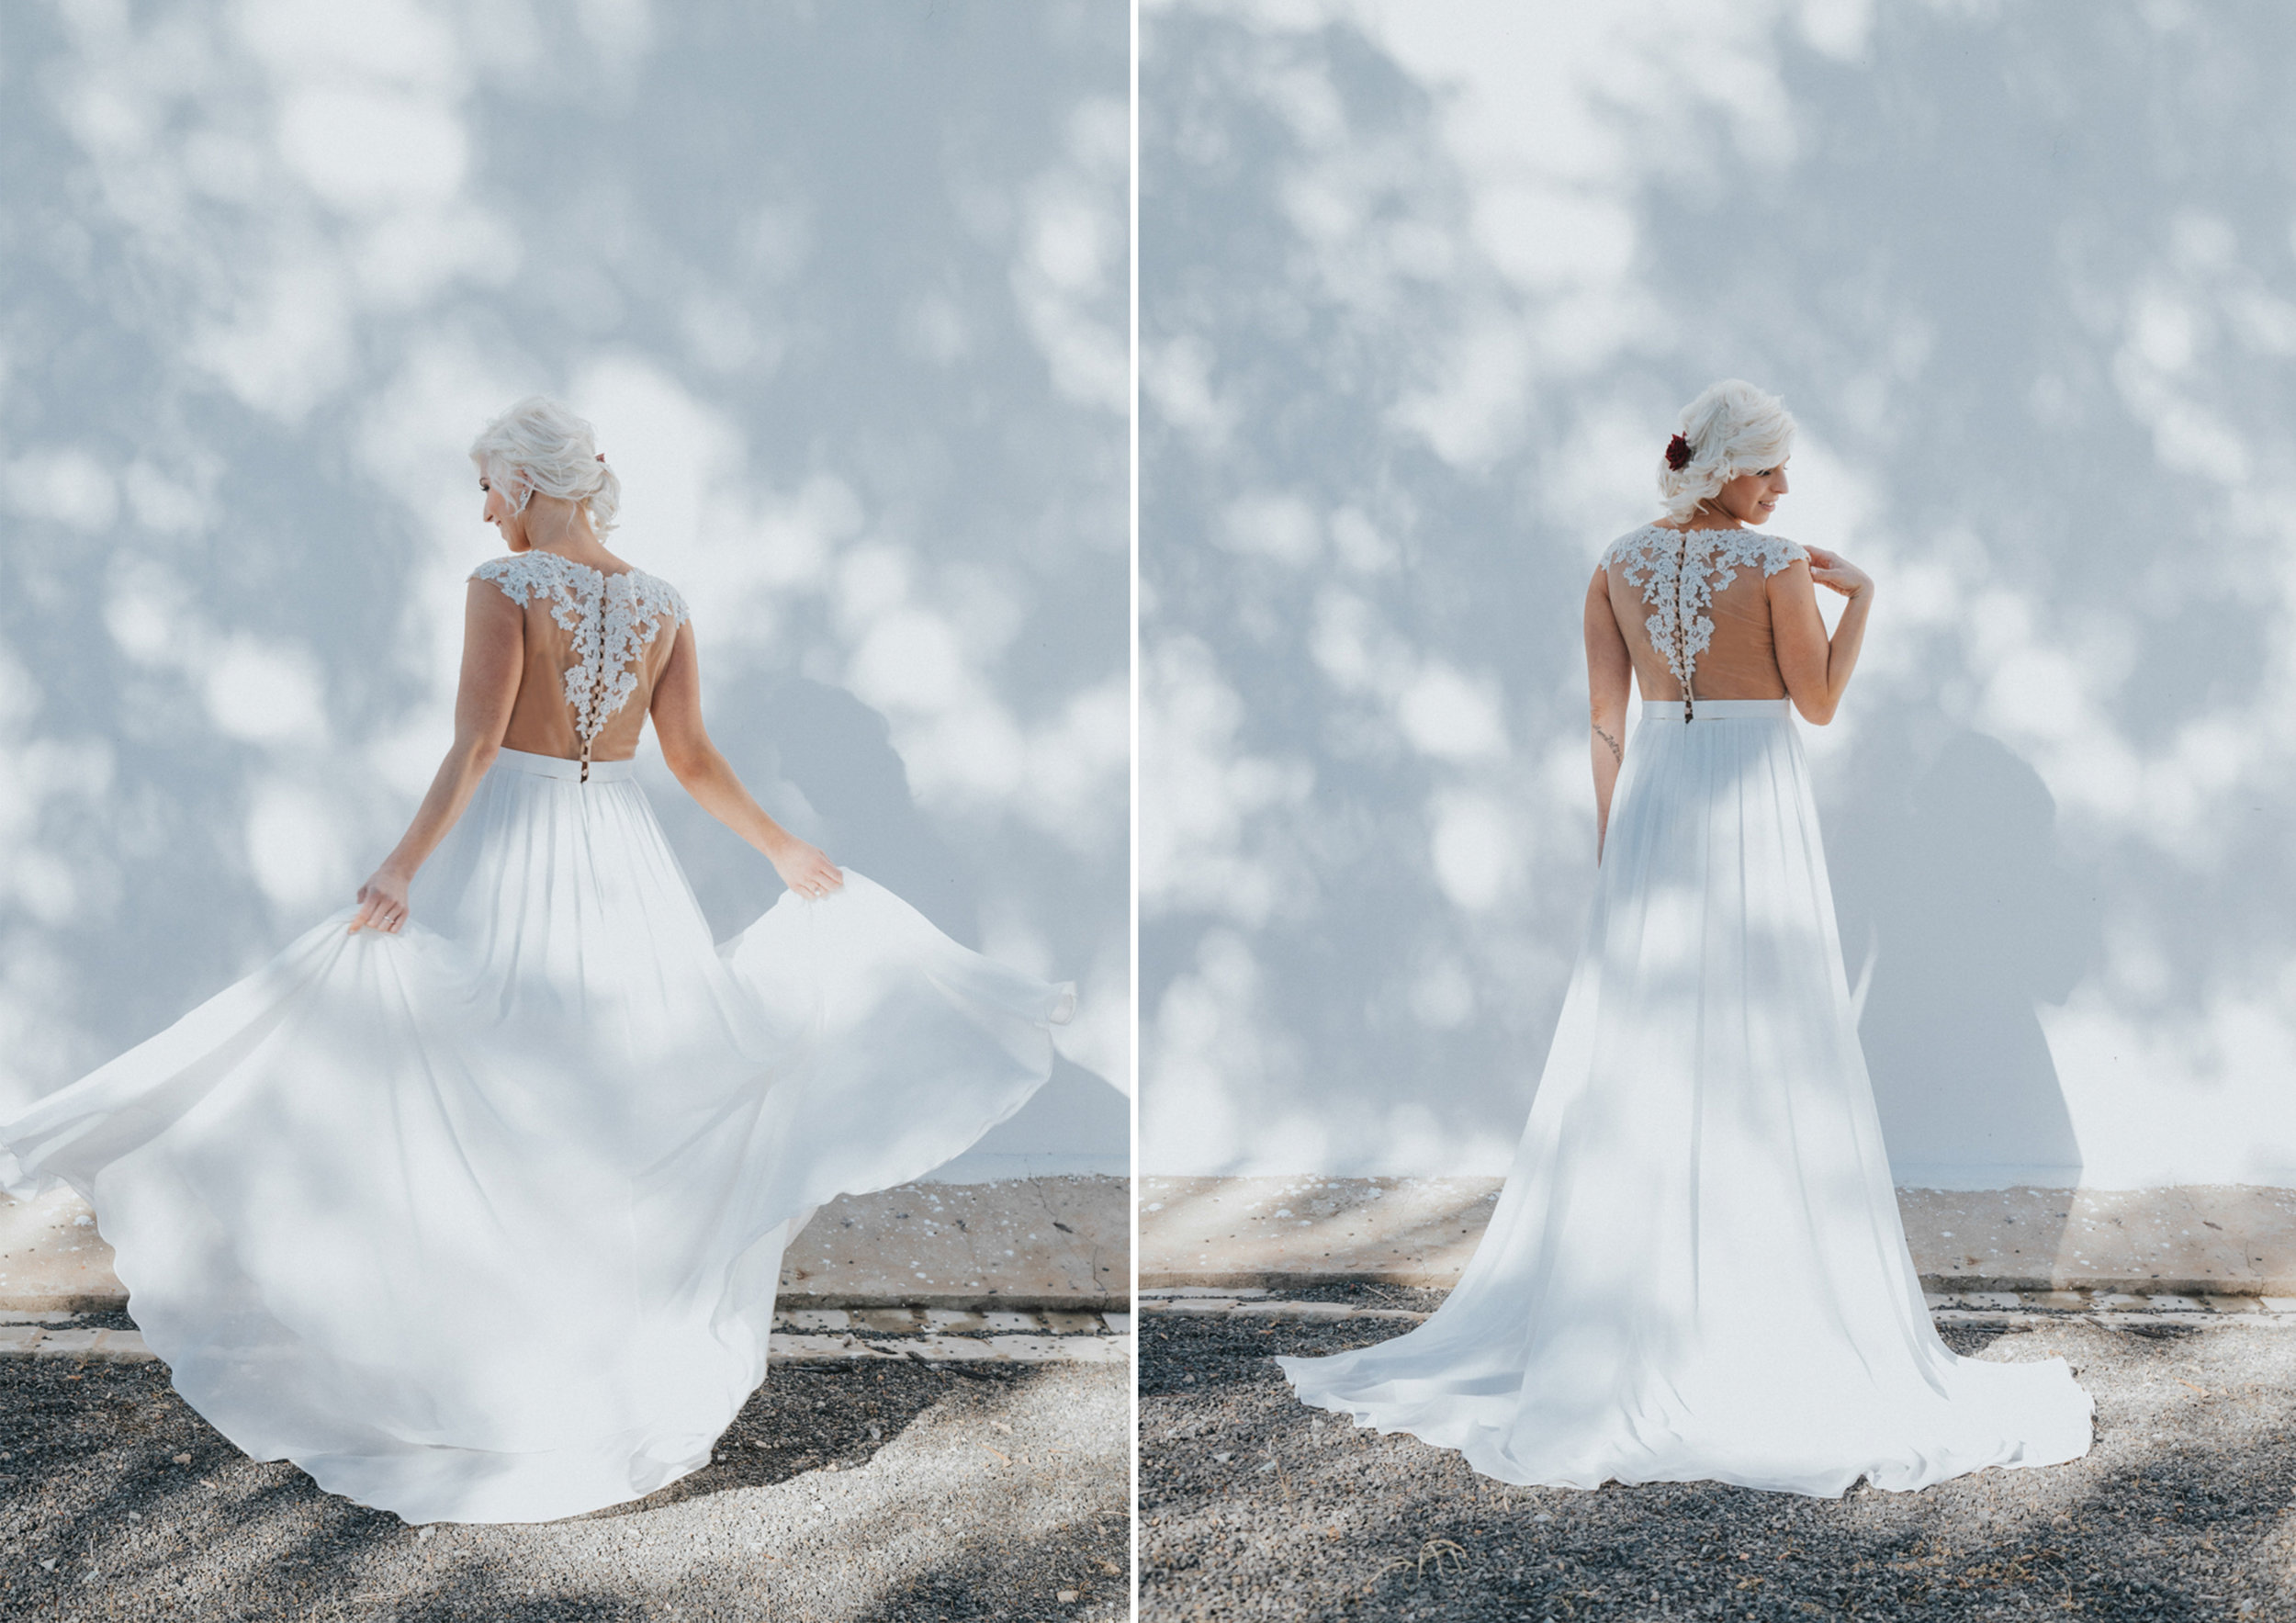 Cape Town Wedding Photographer - Bianca Asher-108.jpg